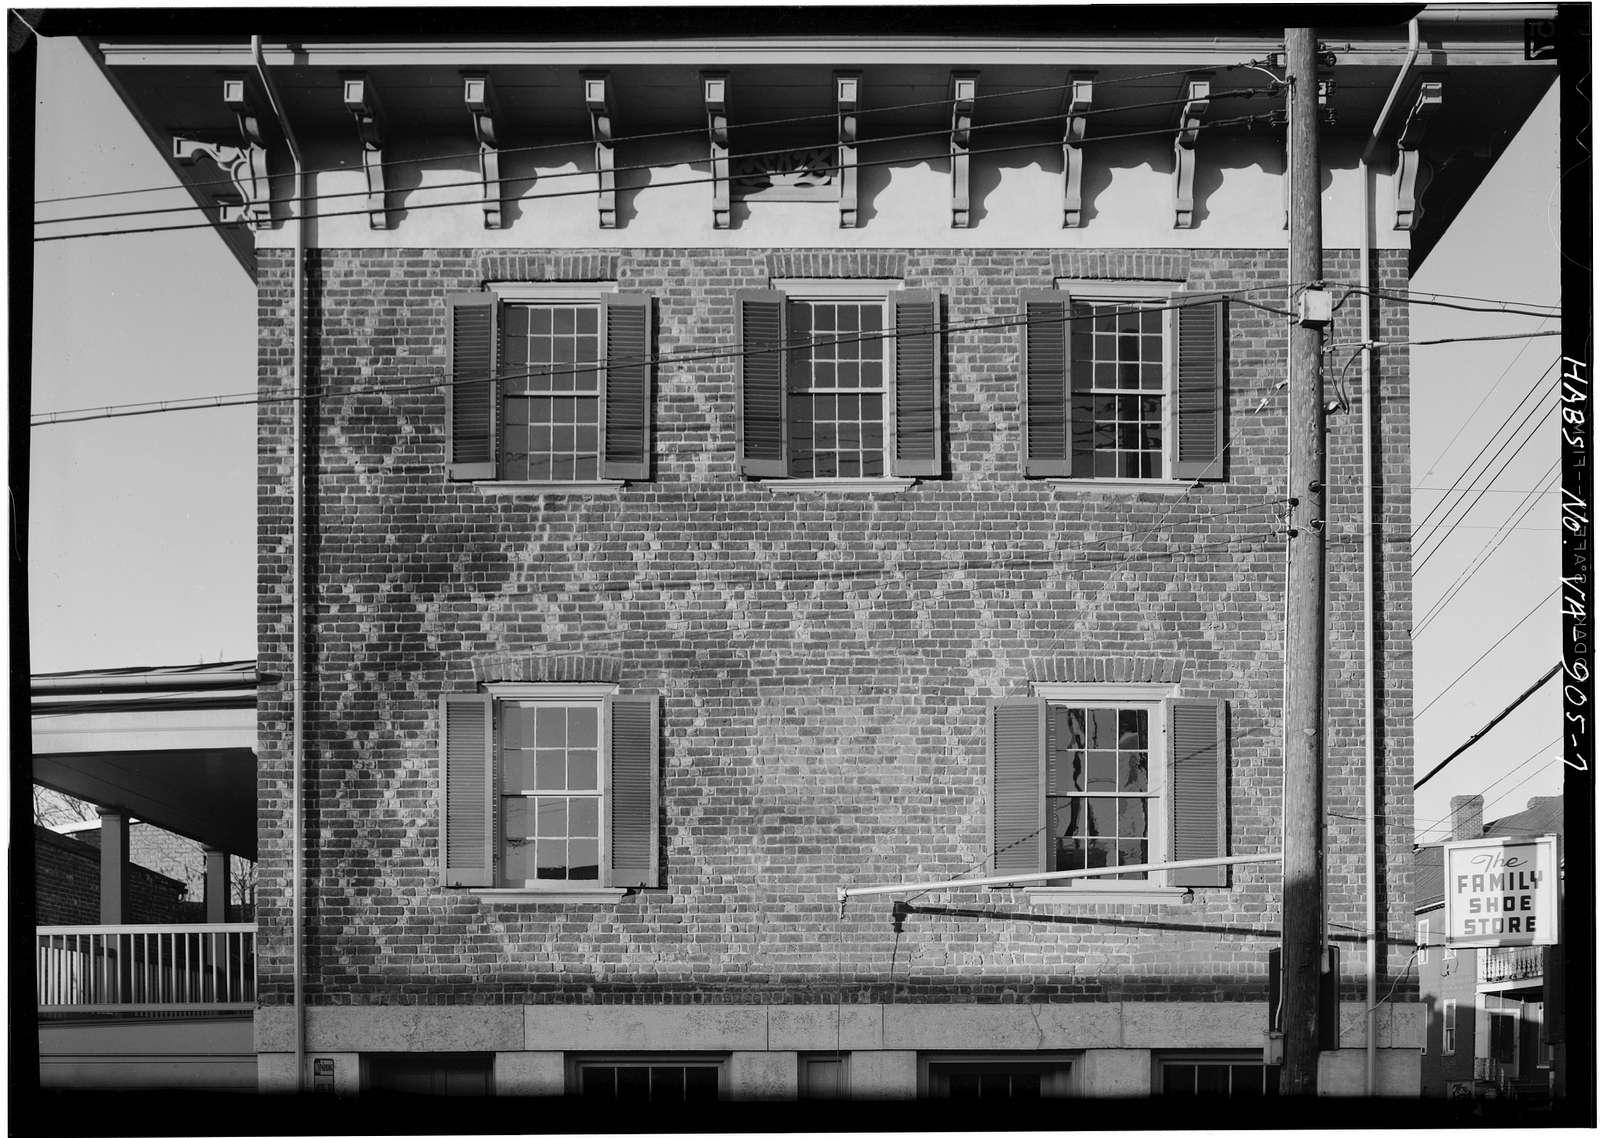 Alexander-Withrow House, 2 North Main Street, Lexington, Lexington, VA